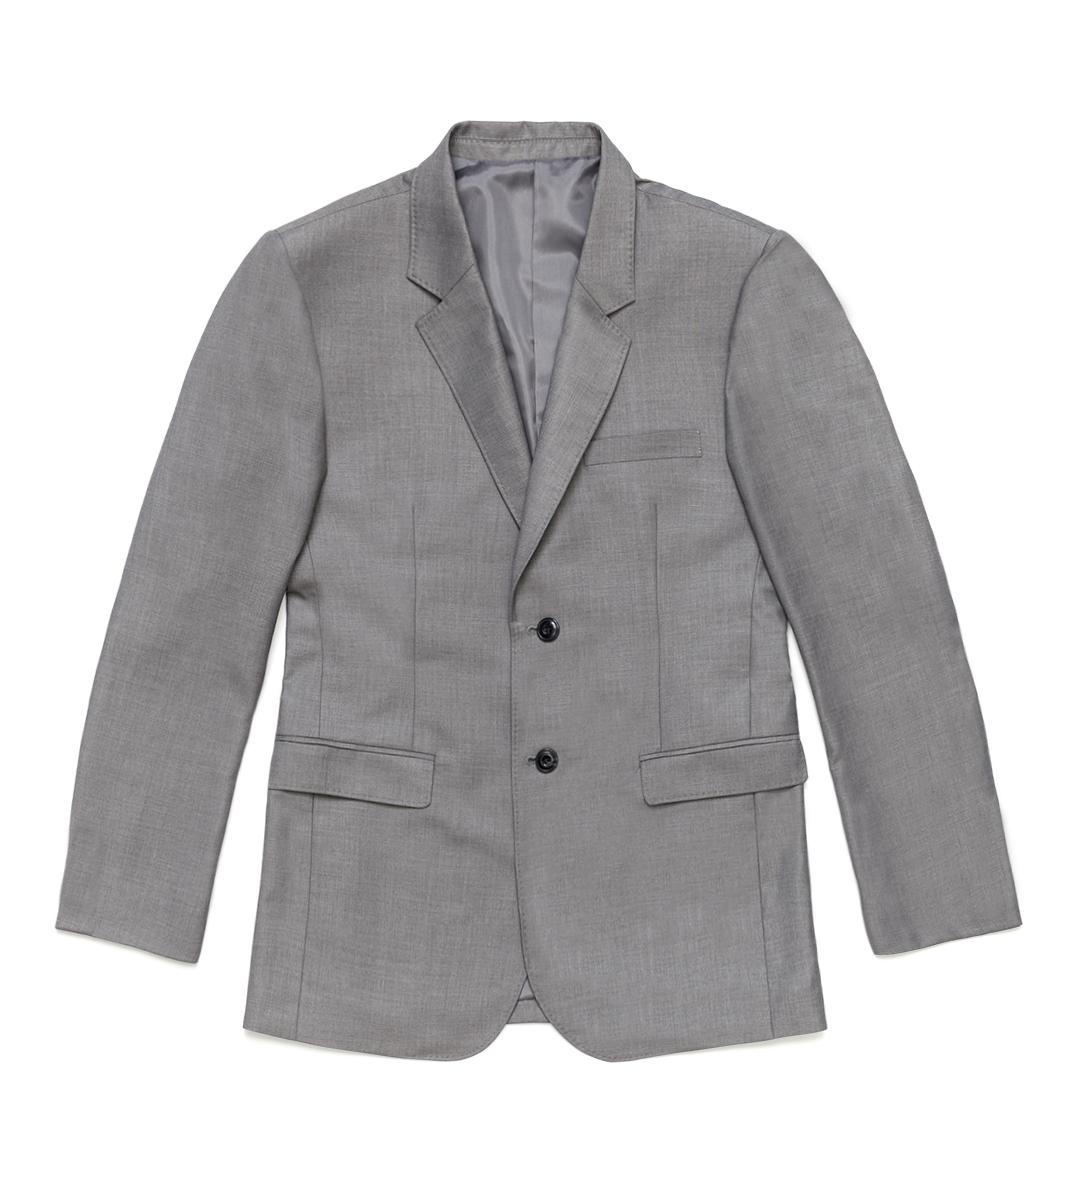 TJ1221_02西裝領regular-fit西裝外套